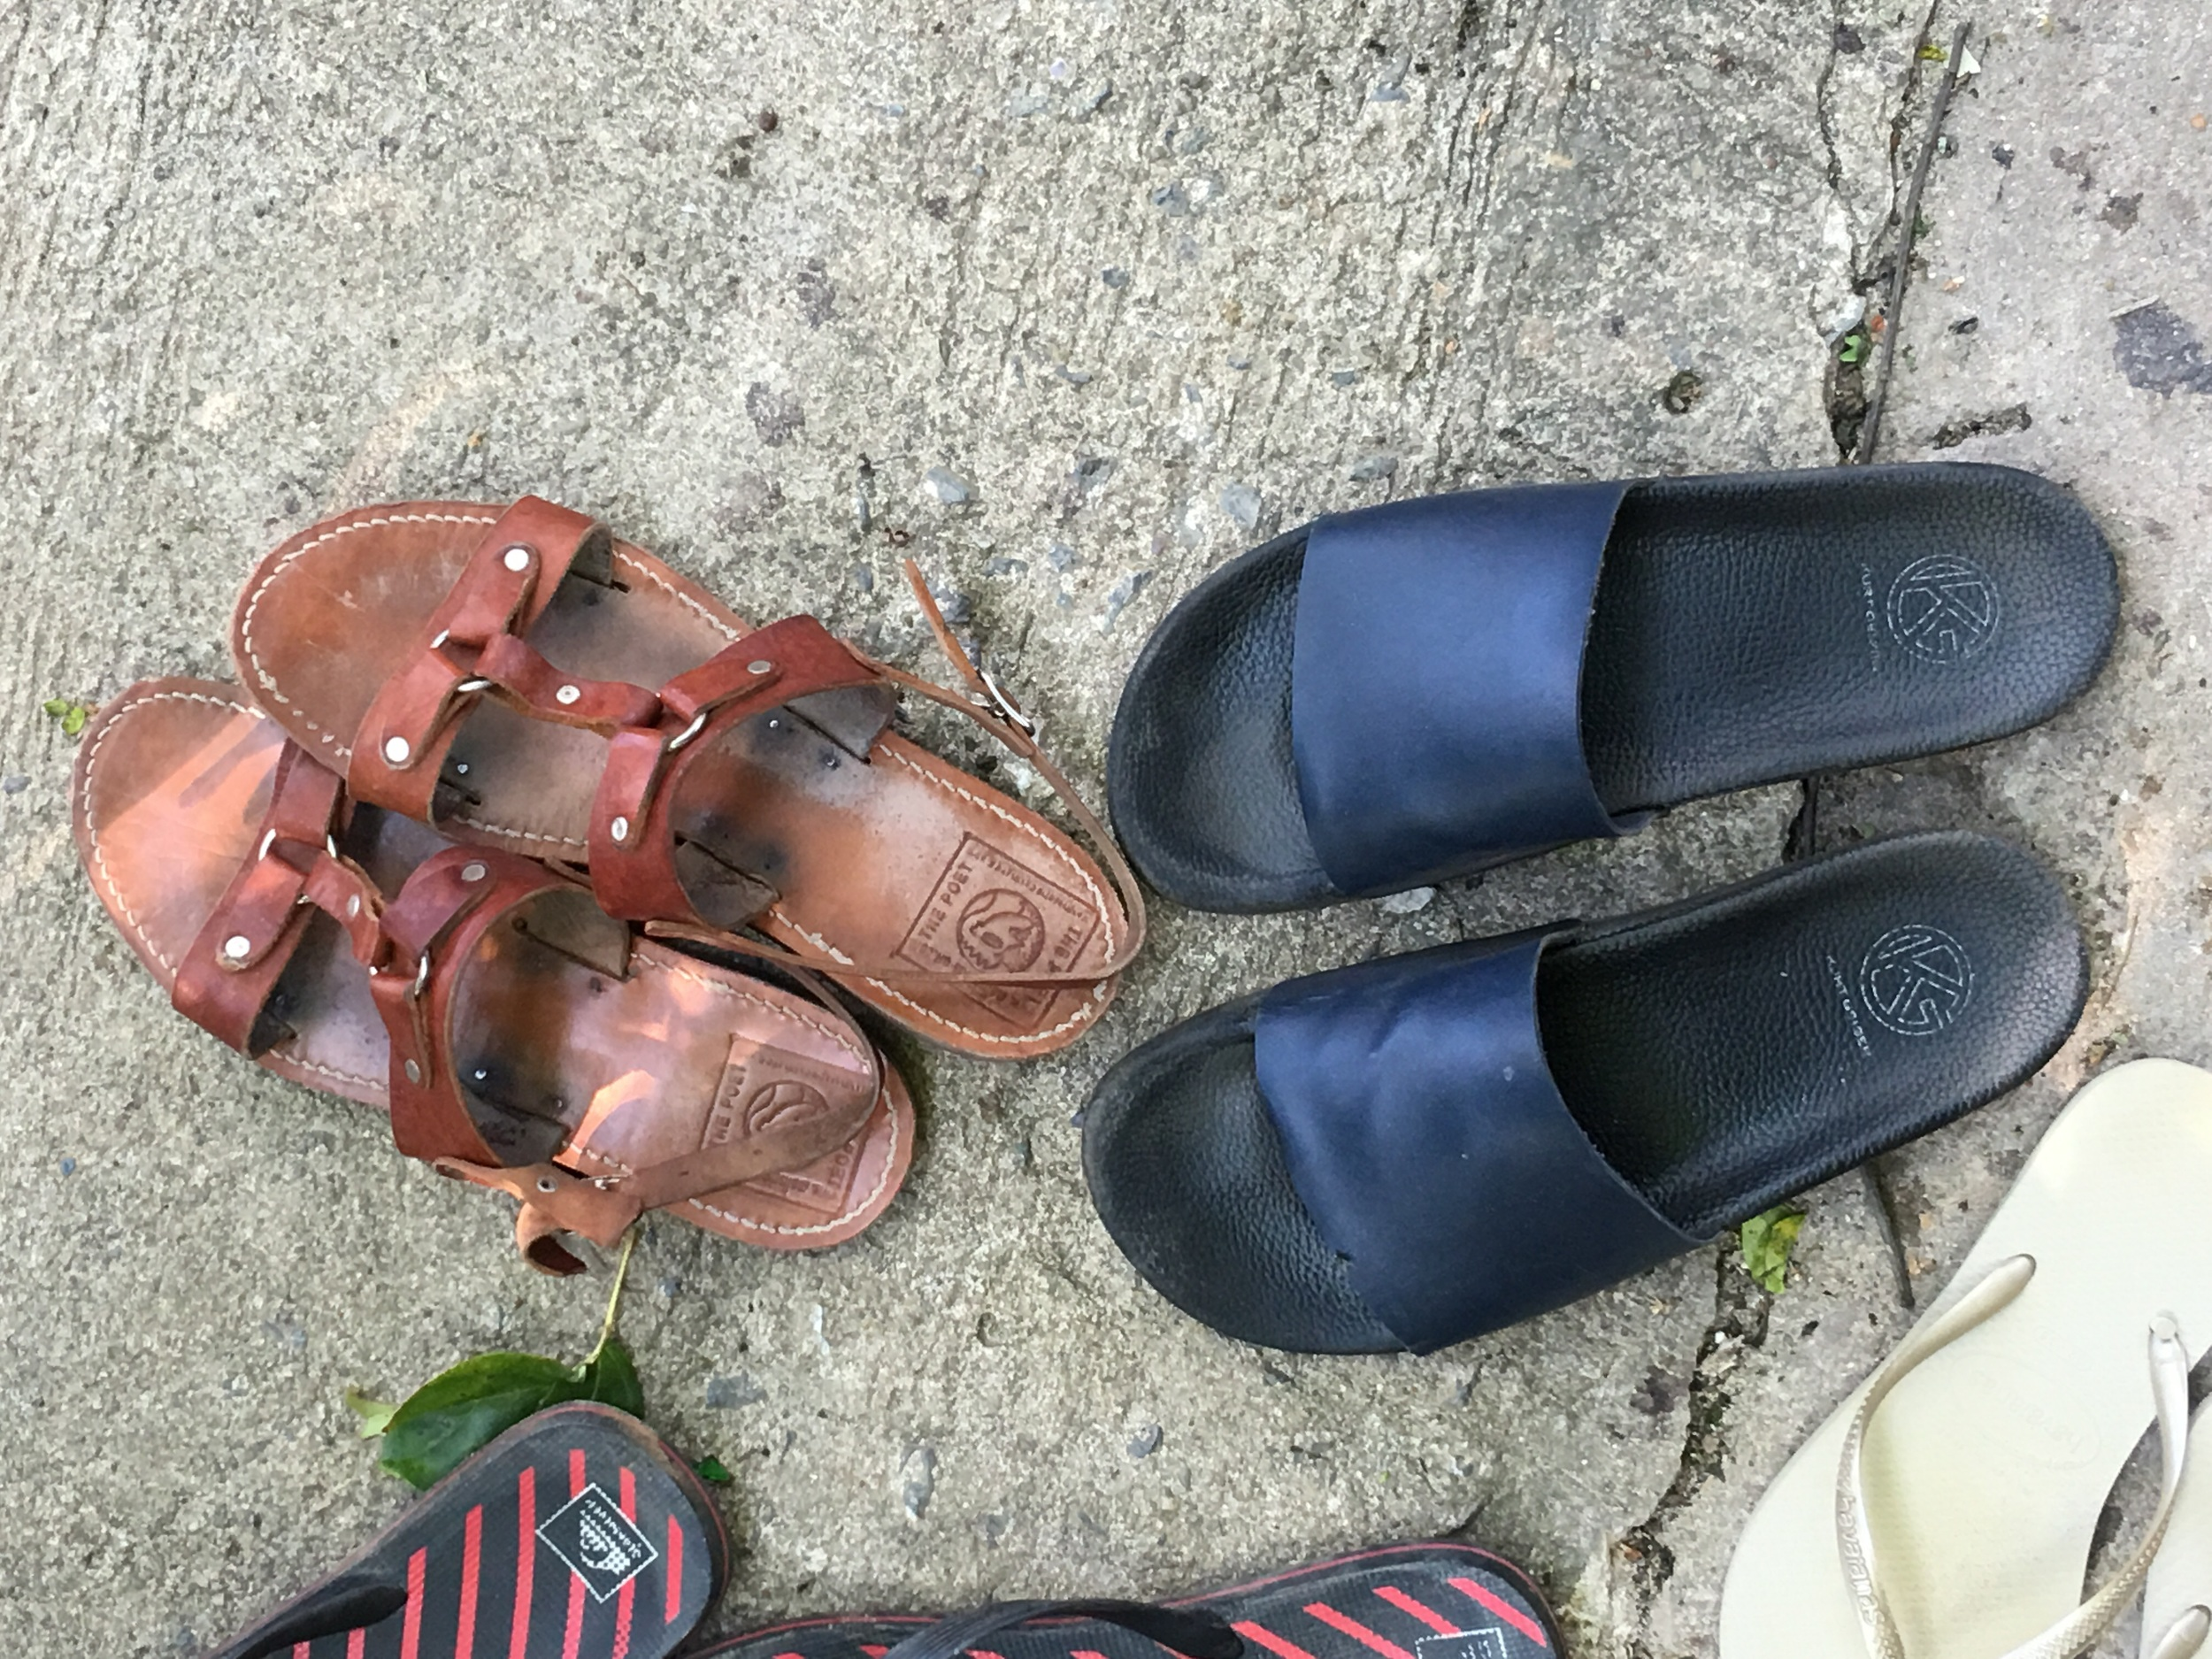 my greek sandals and Jodie's minimal chanclas